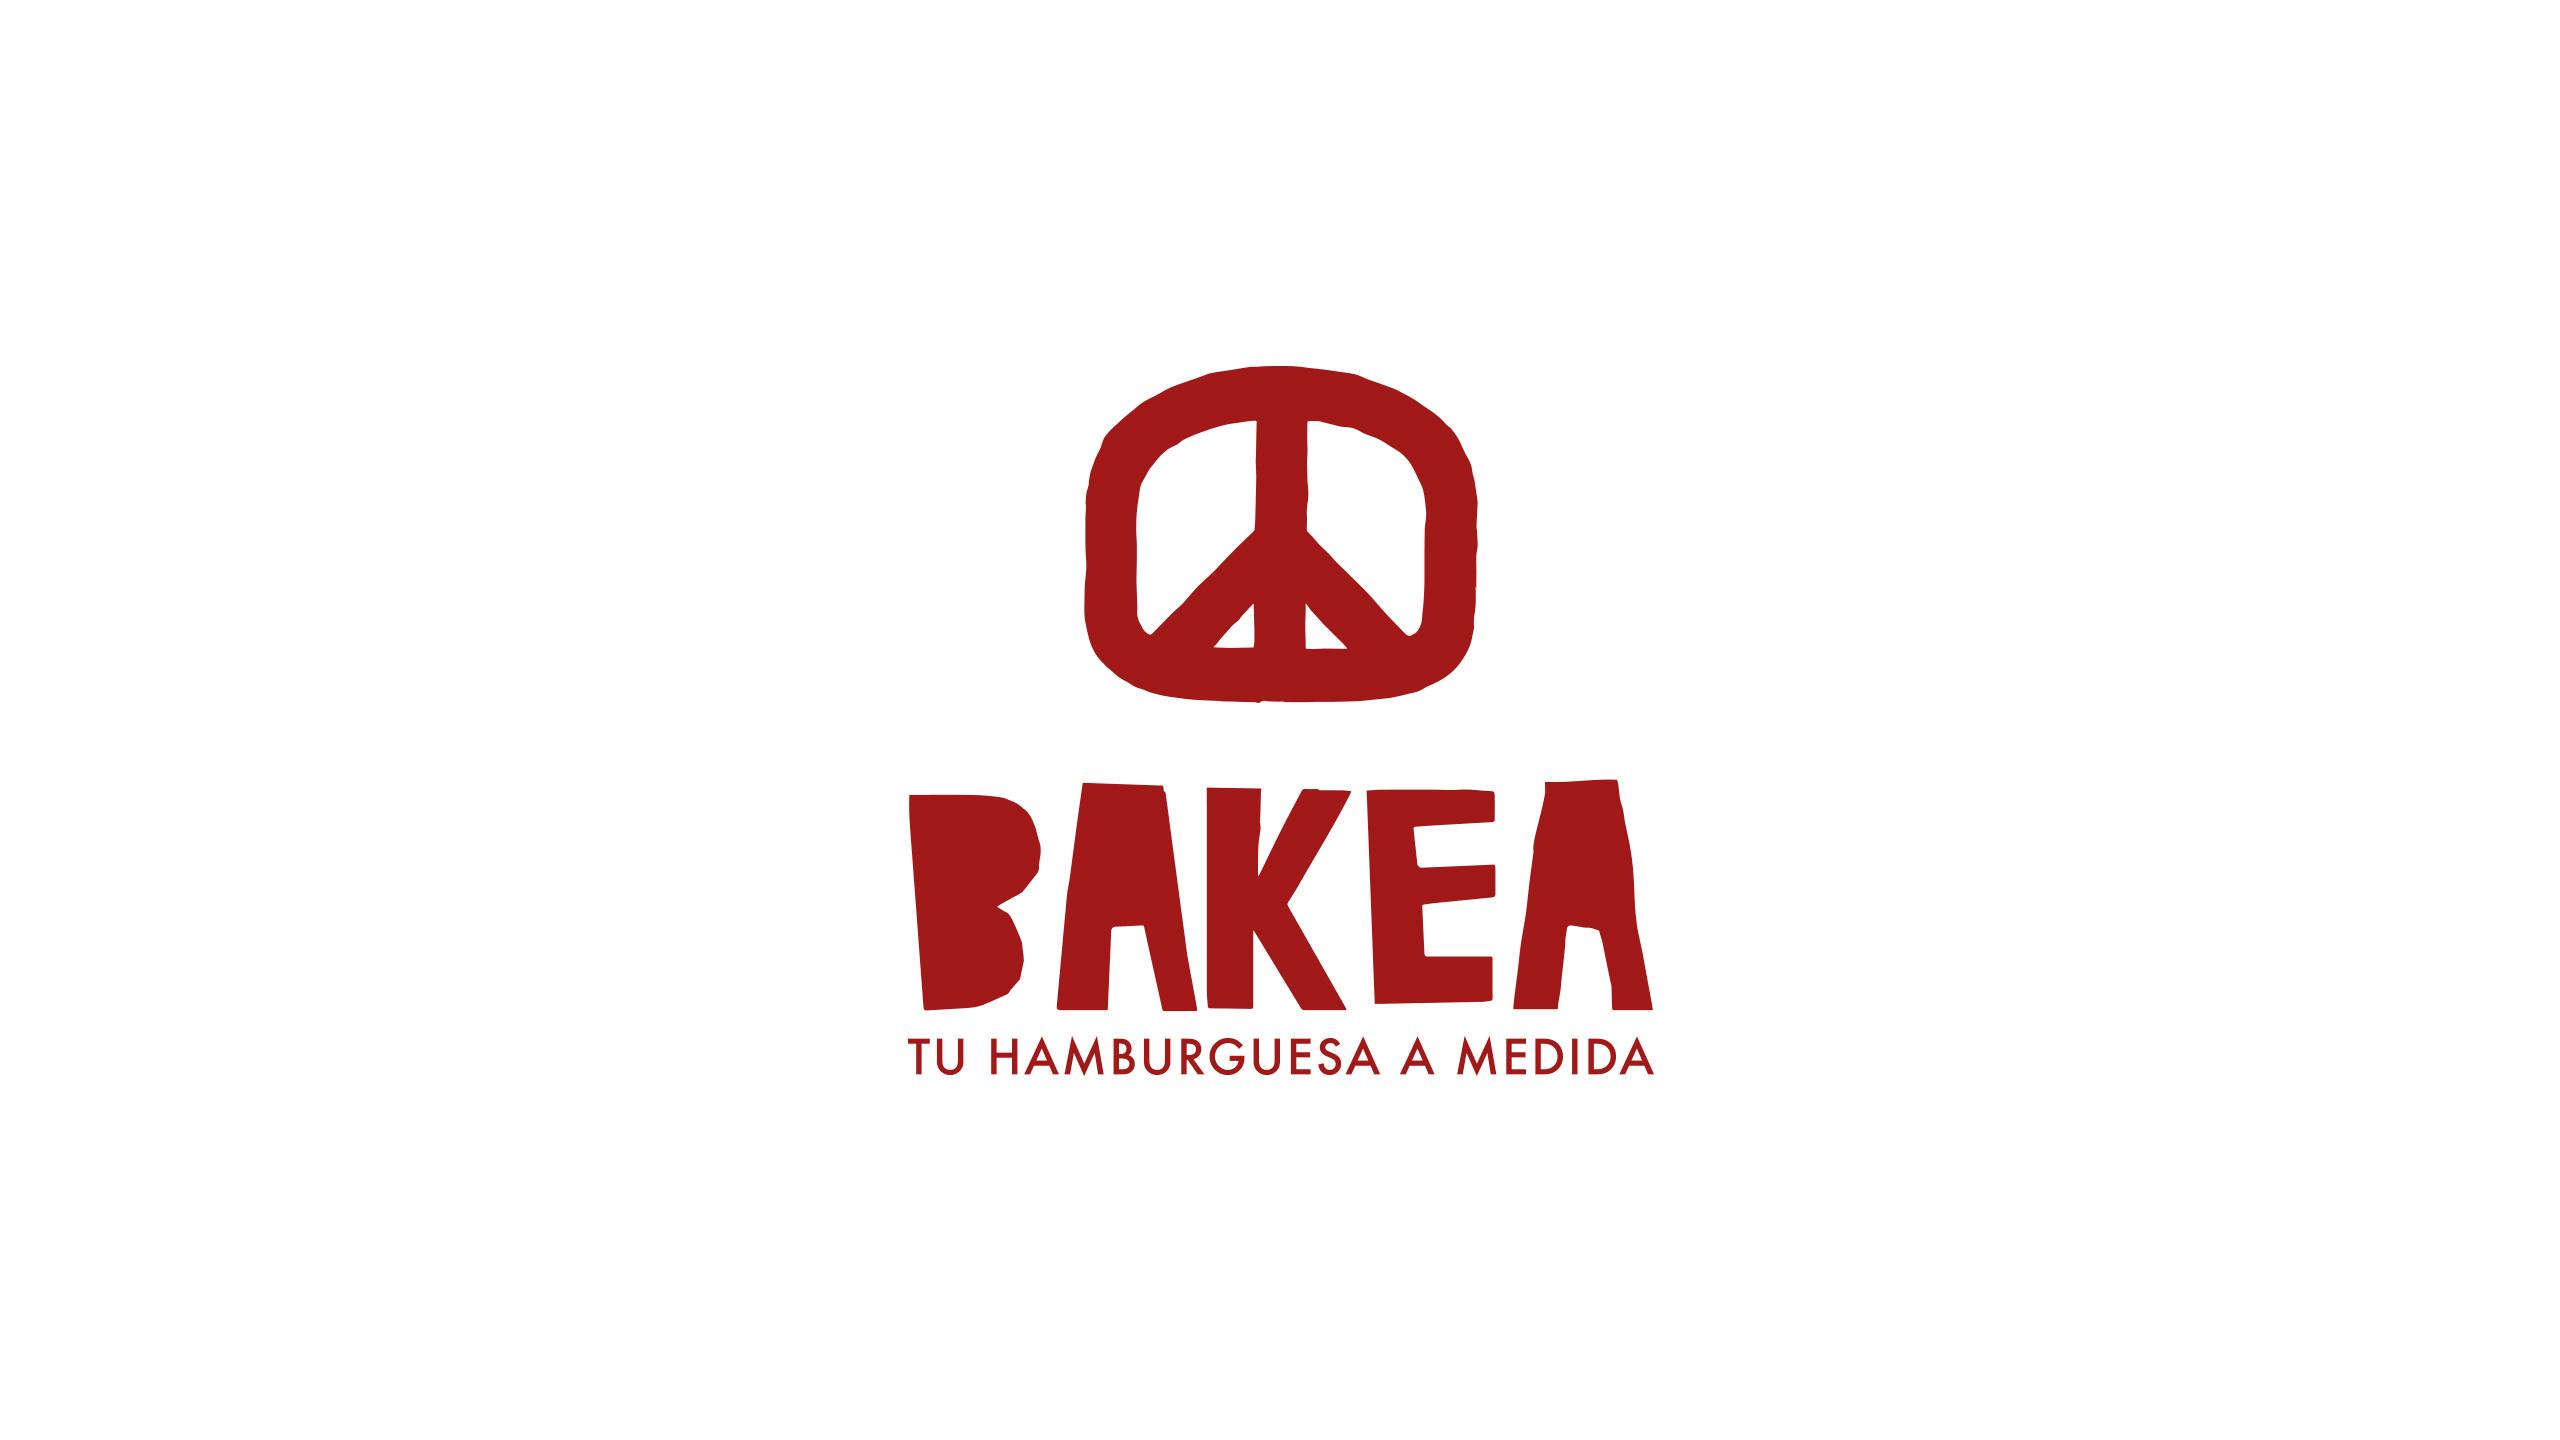 kamikaze_identidad_bakea_04